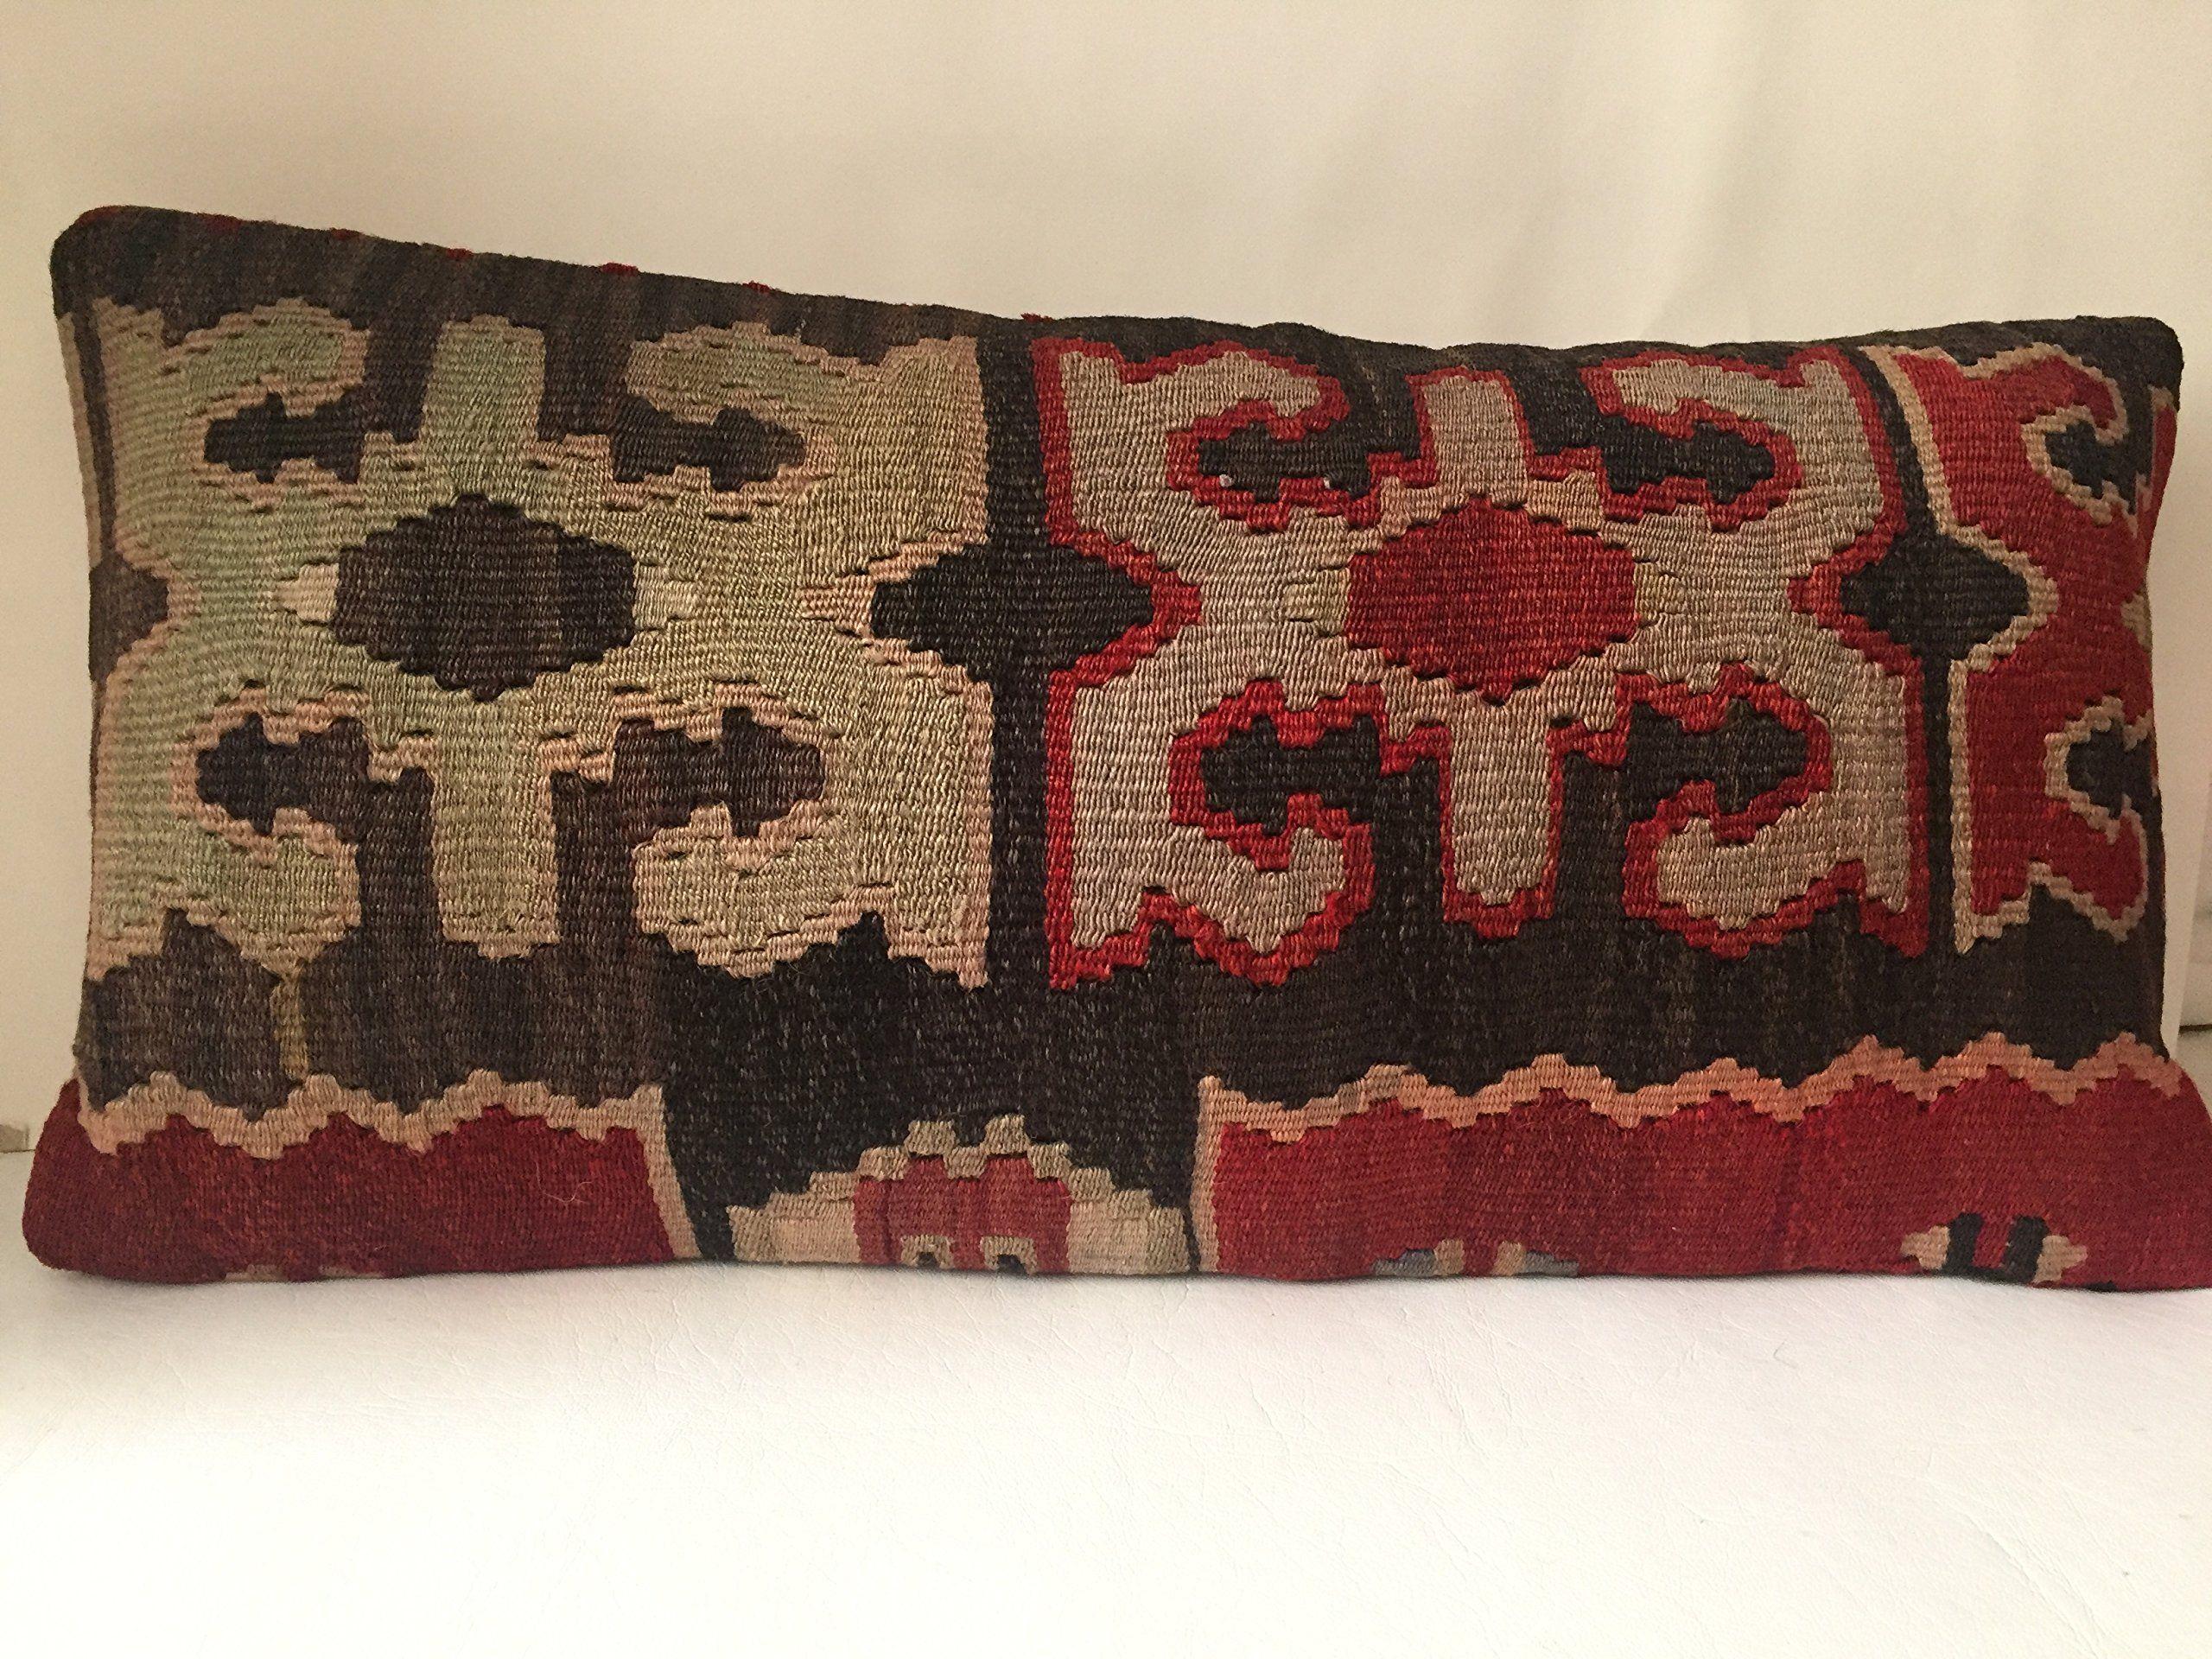 Lumbar Kilim Pillow 12 x 24 Anatolian Turkish Cushion Cover